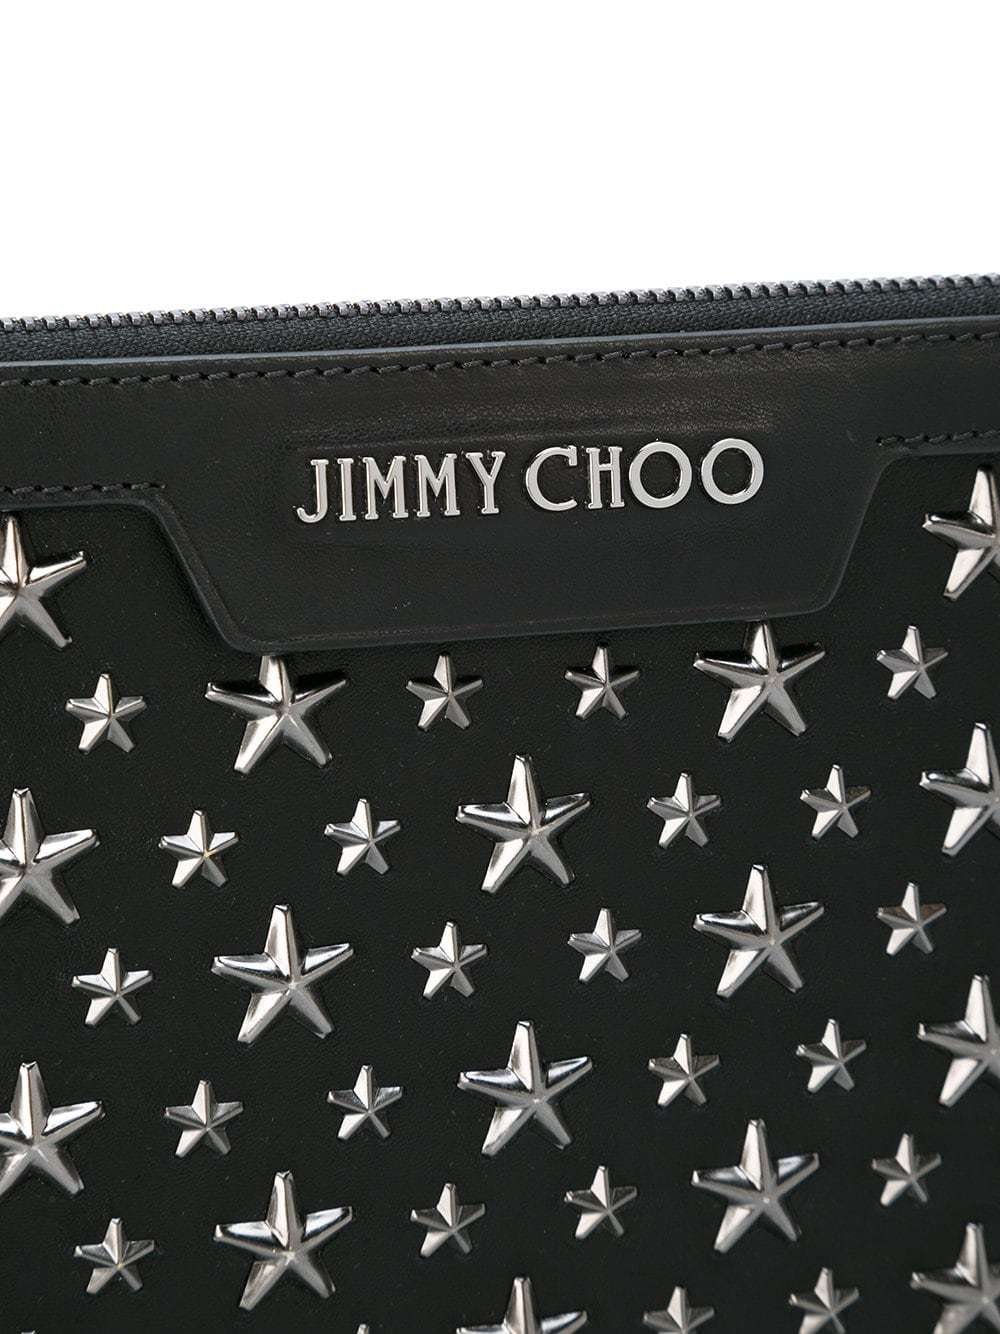 a4a4f3a74ced ... Embellished Leather Zip Pouches Jimmy Choo Mini Derek Clutch ...